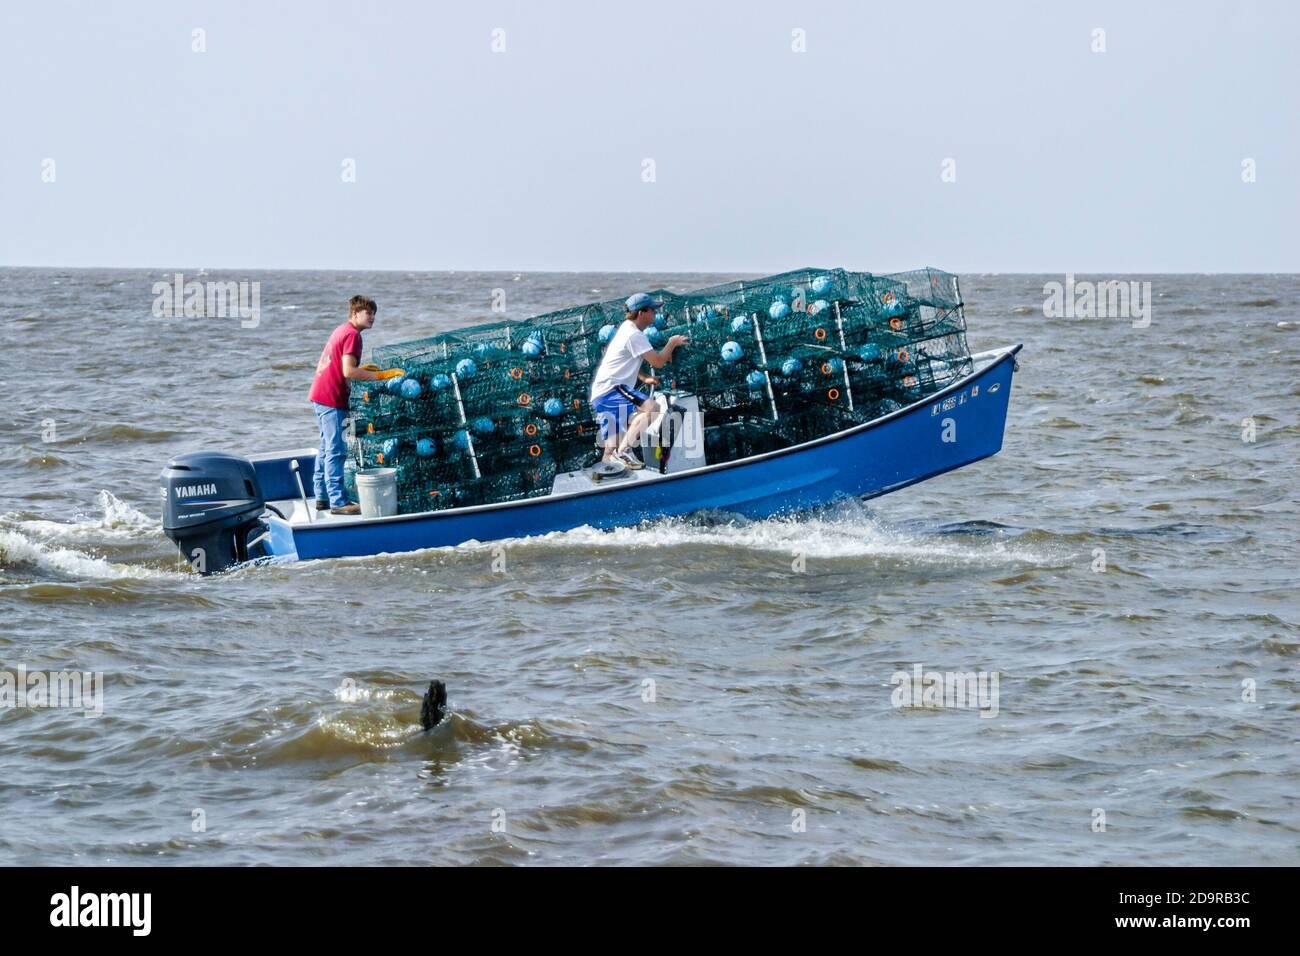 Louisiana Lake Pontchartrain Saint St. Tammany Parish Madisonville, boat loaded full filled crab traps, Stock Photo